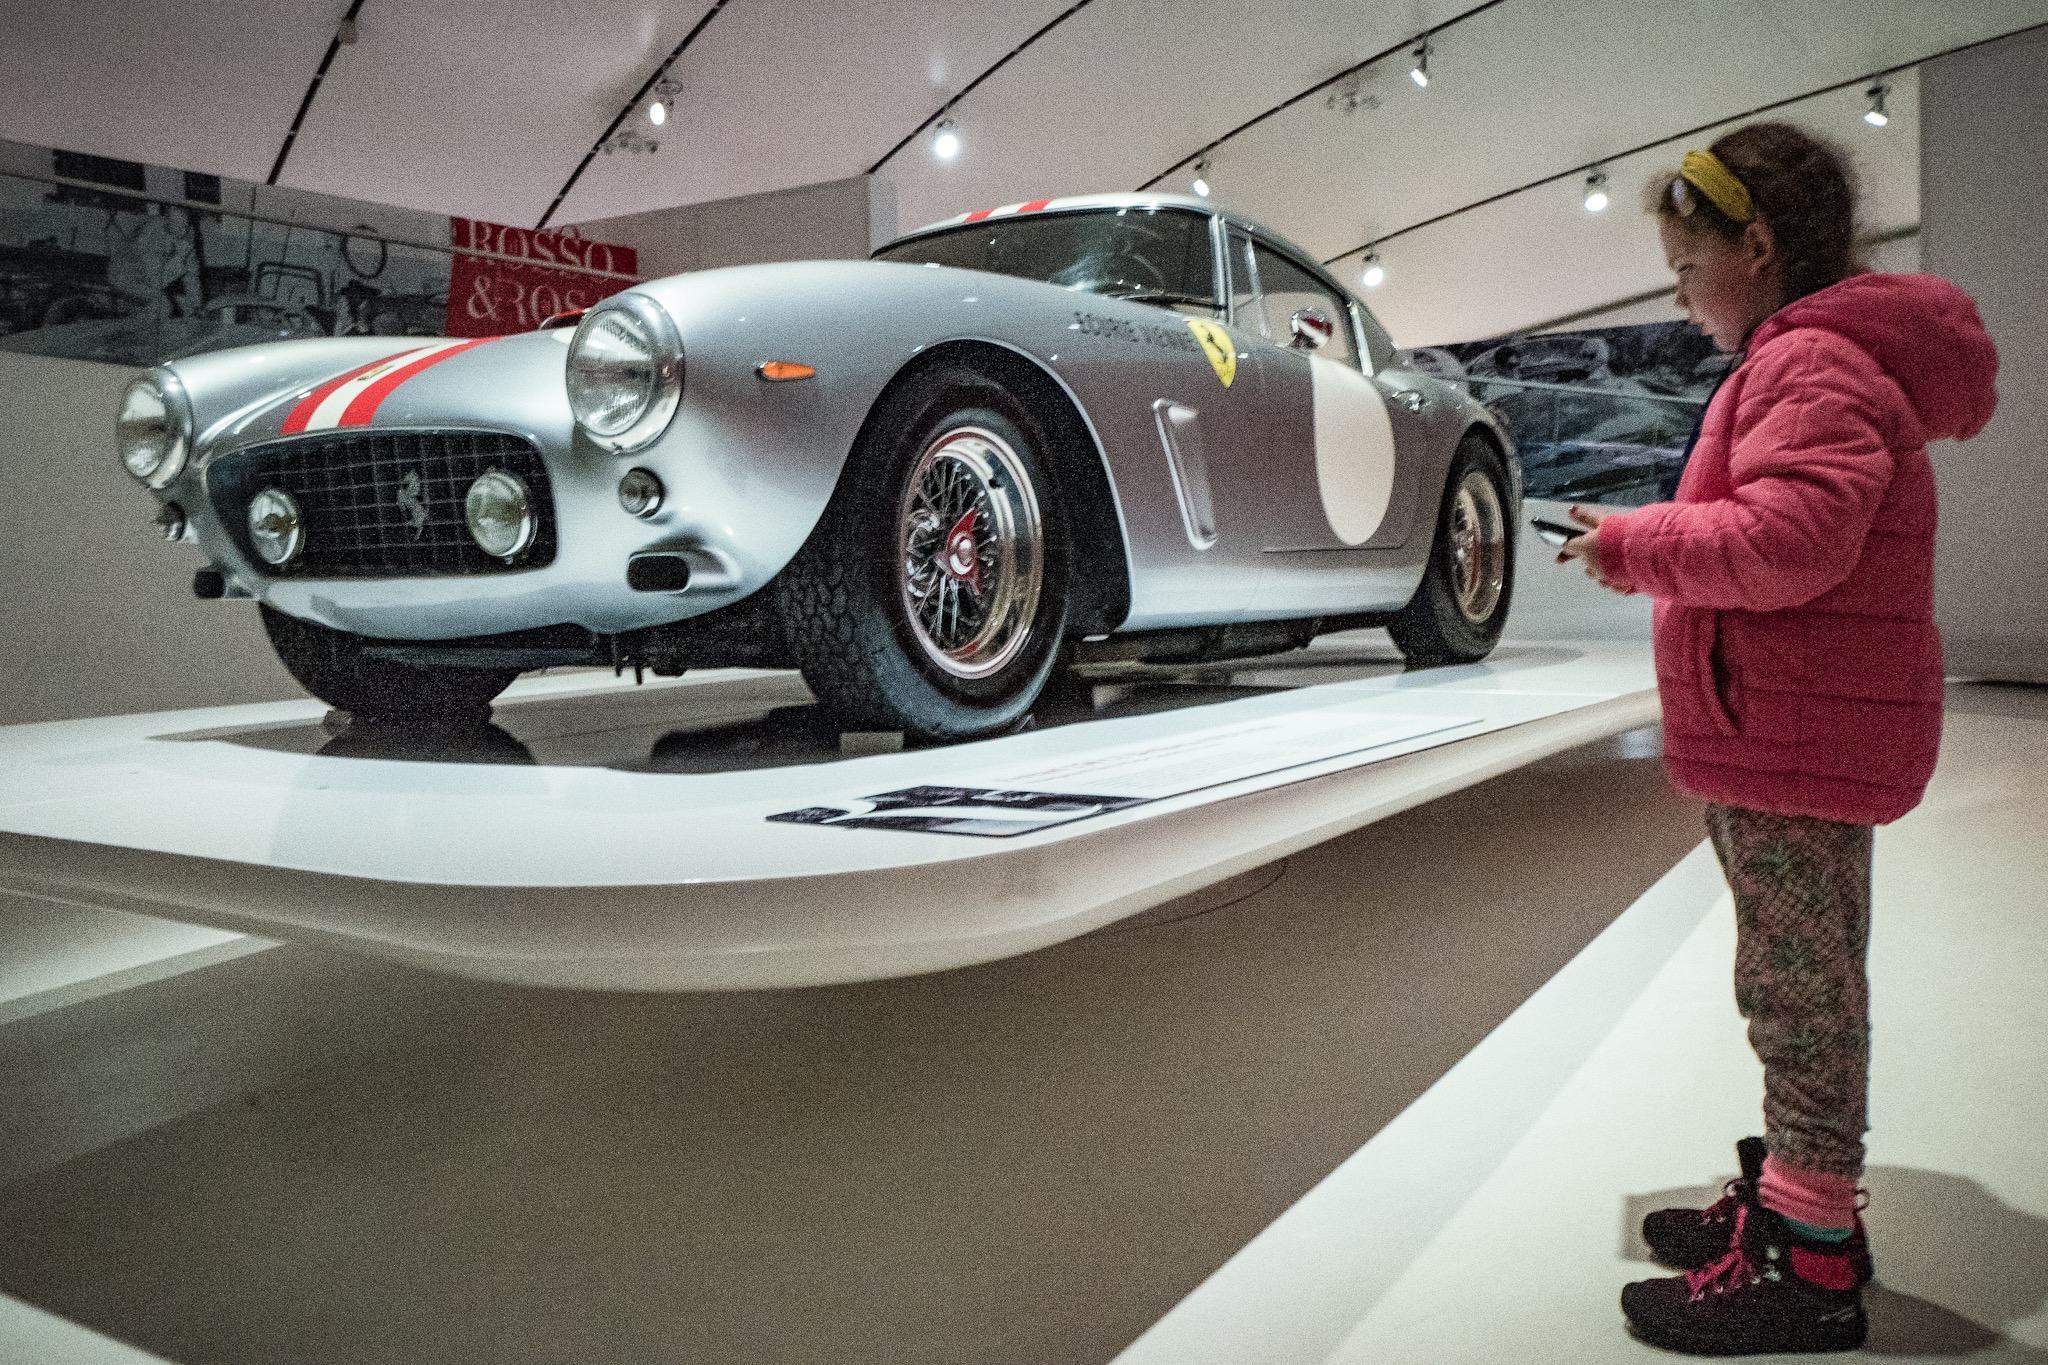 Audrey directing us around the Ferrari Museum on the iPad